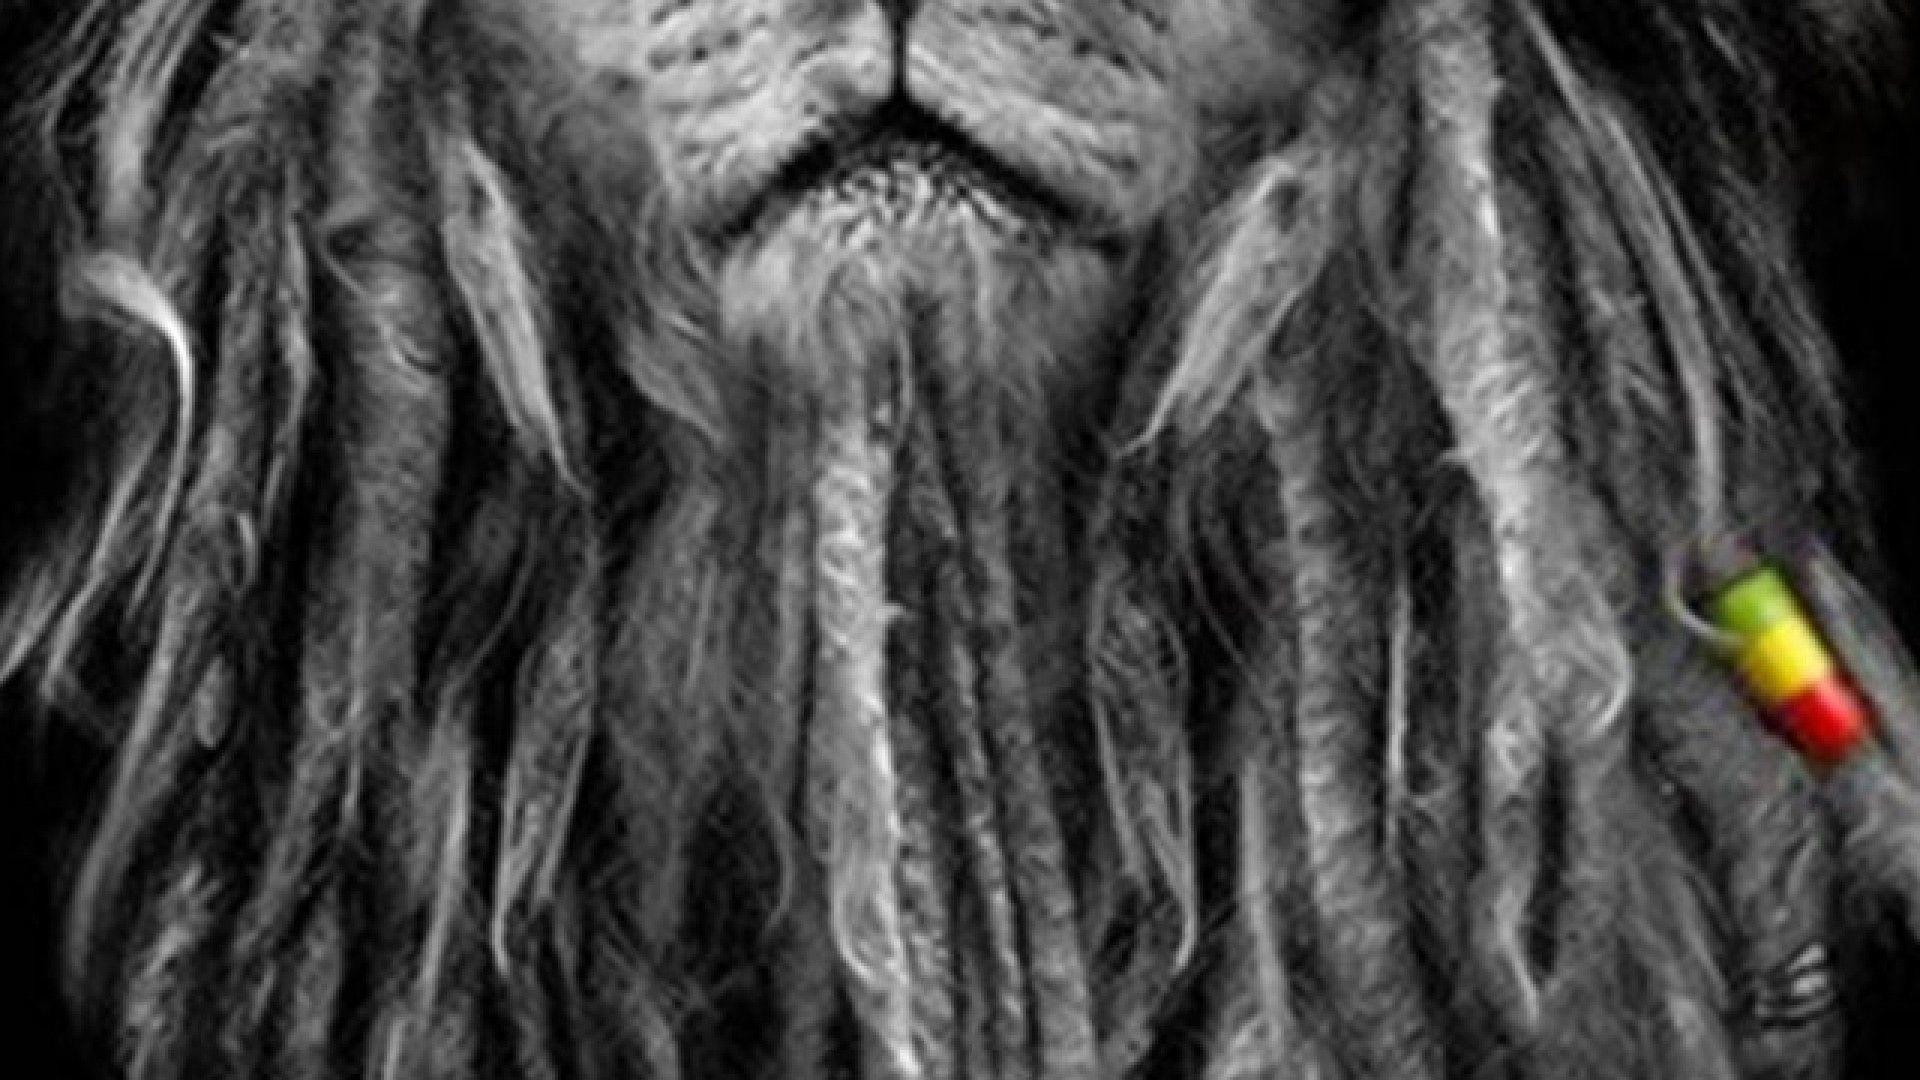 2732x1536 HD Rasta Wallpapers Wallpaper 2732×1536